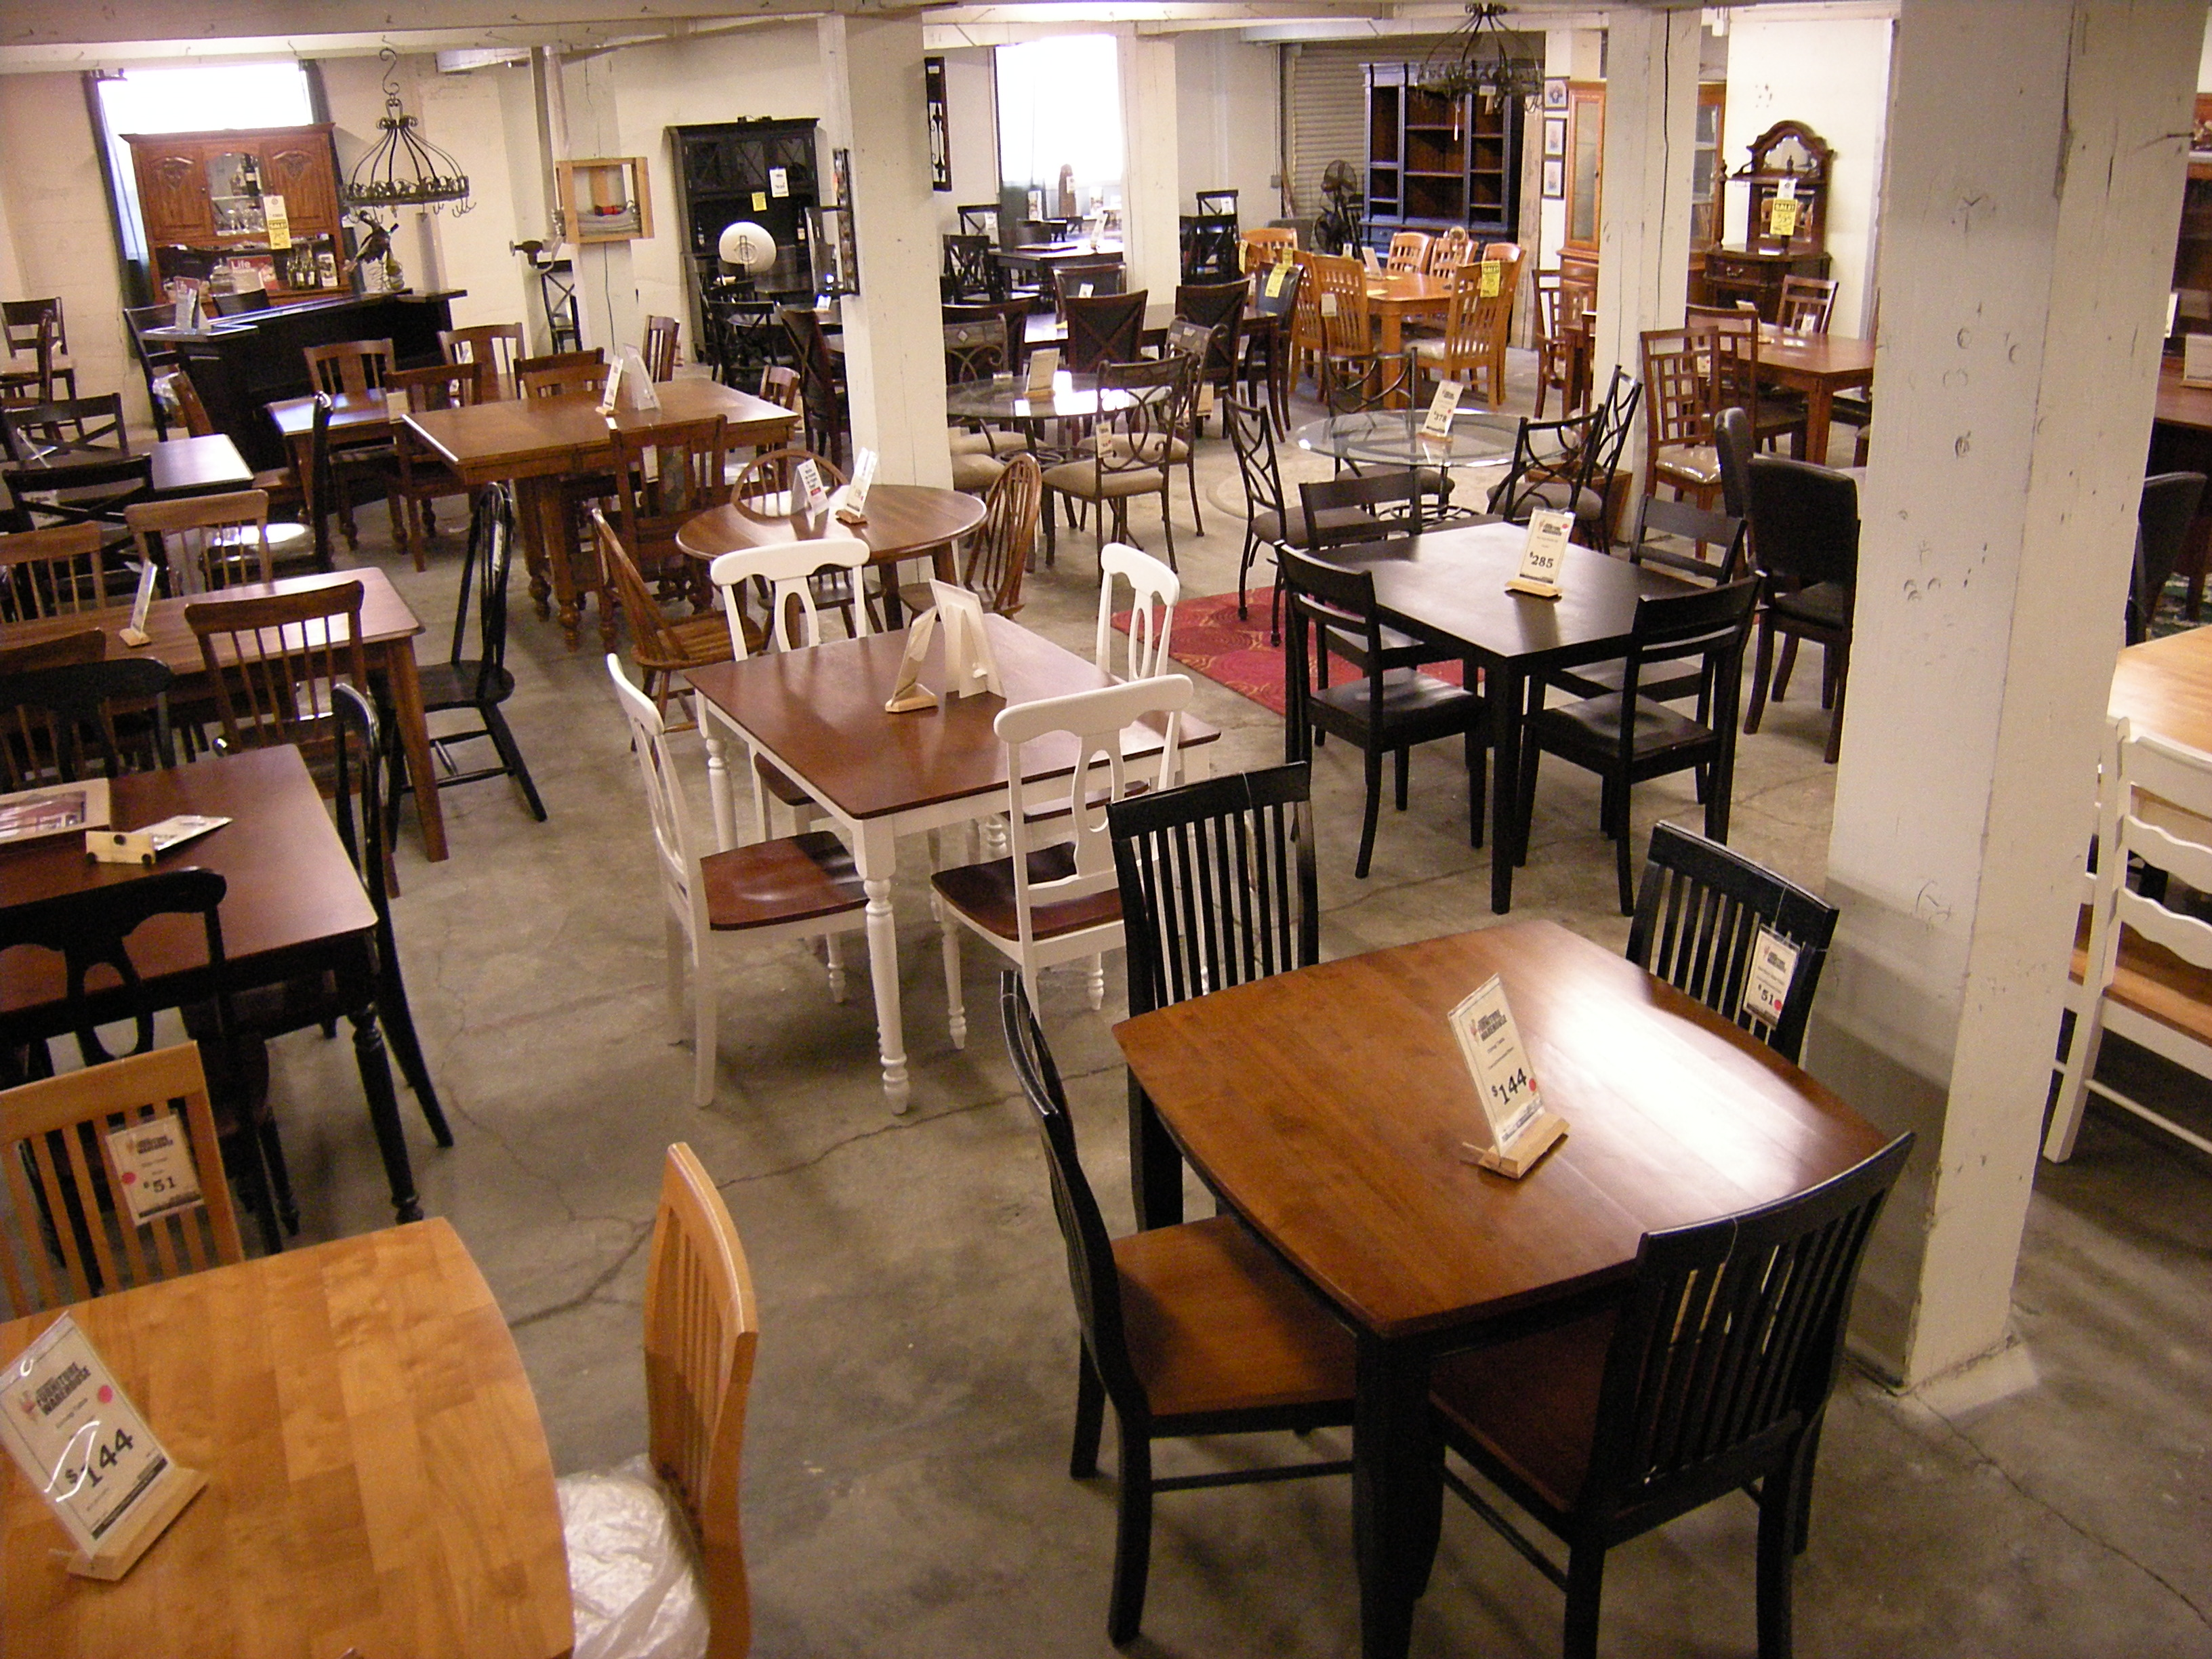 File:Everett - Designer's Furniture Warehouse interior.jpg ...